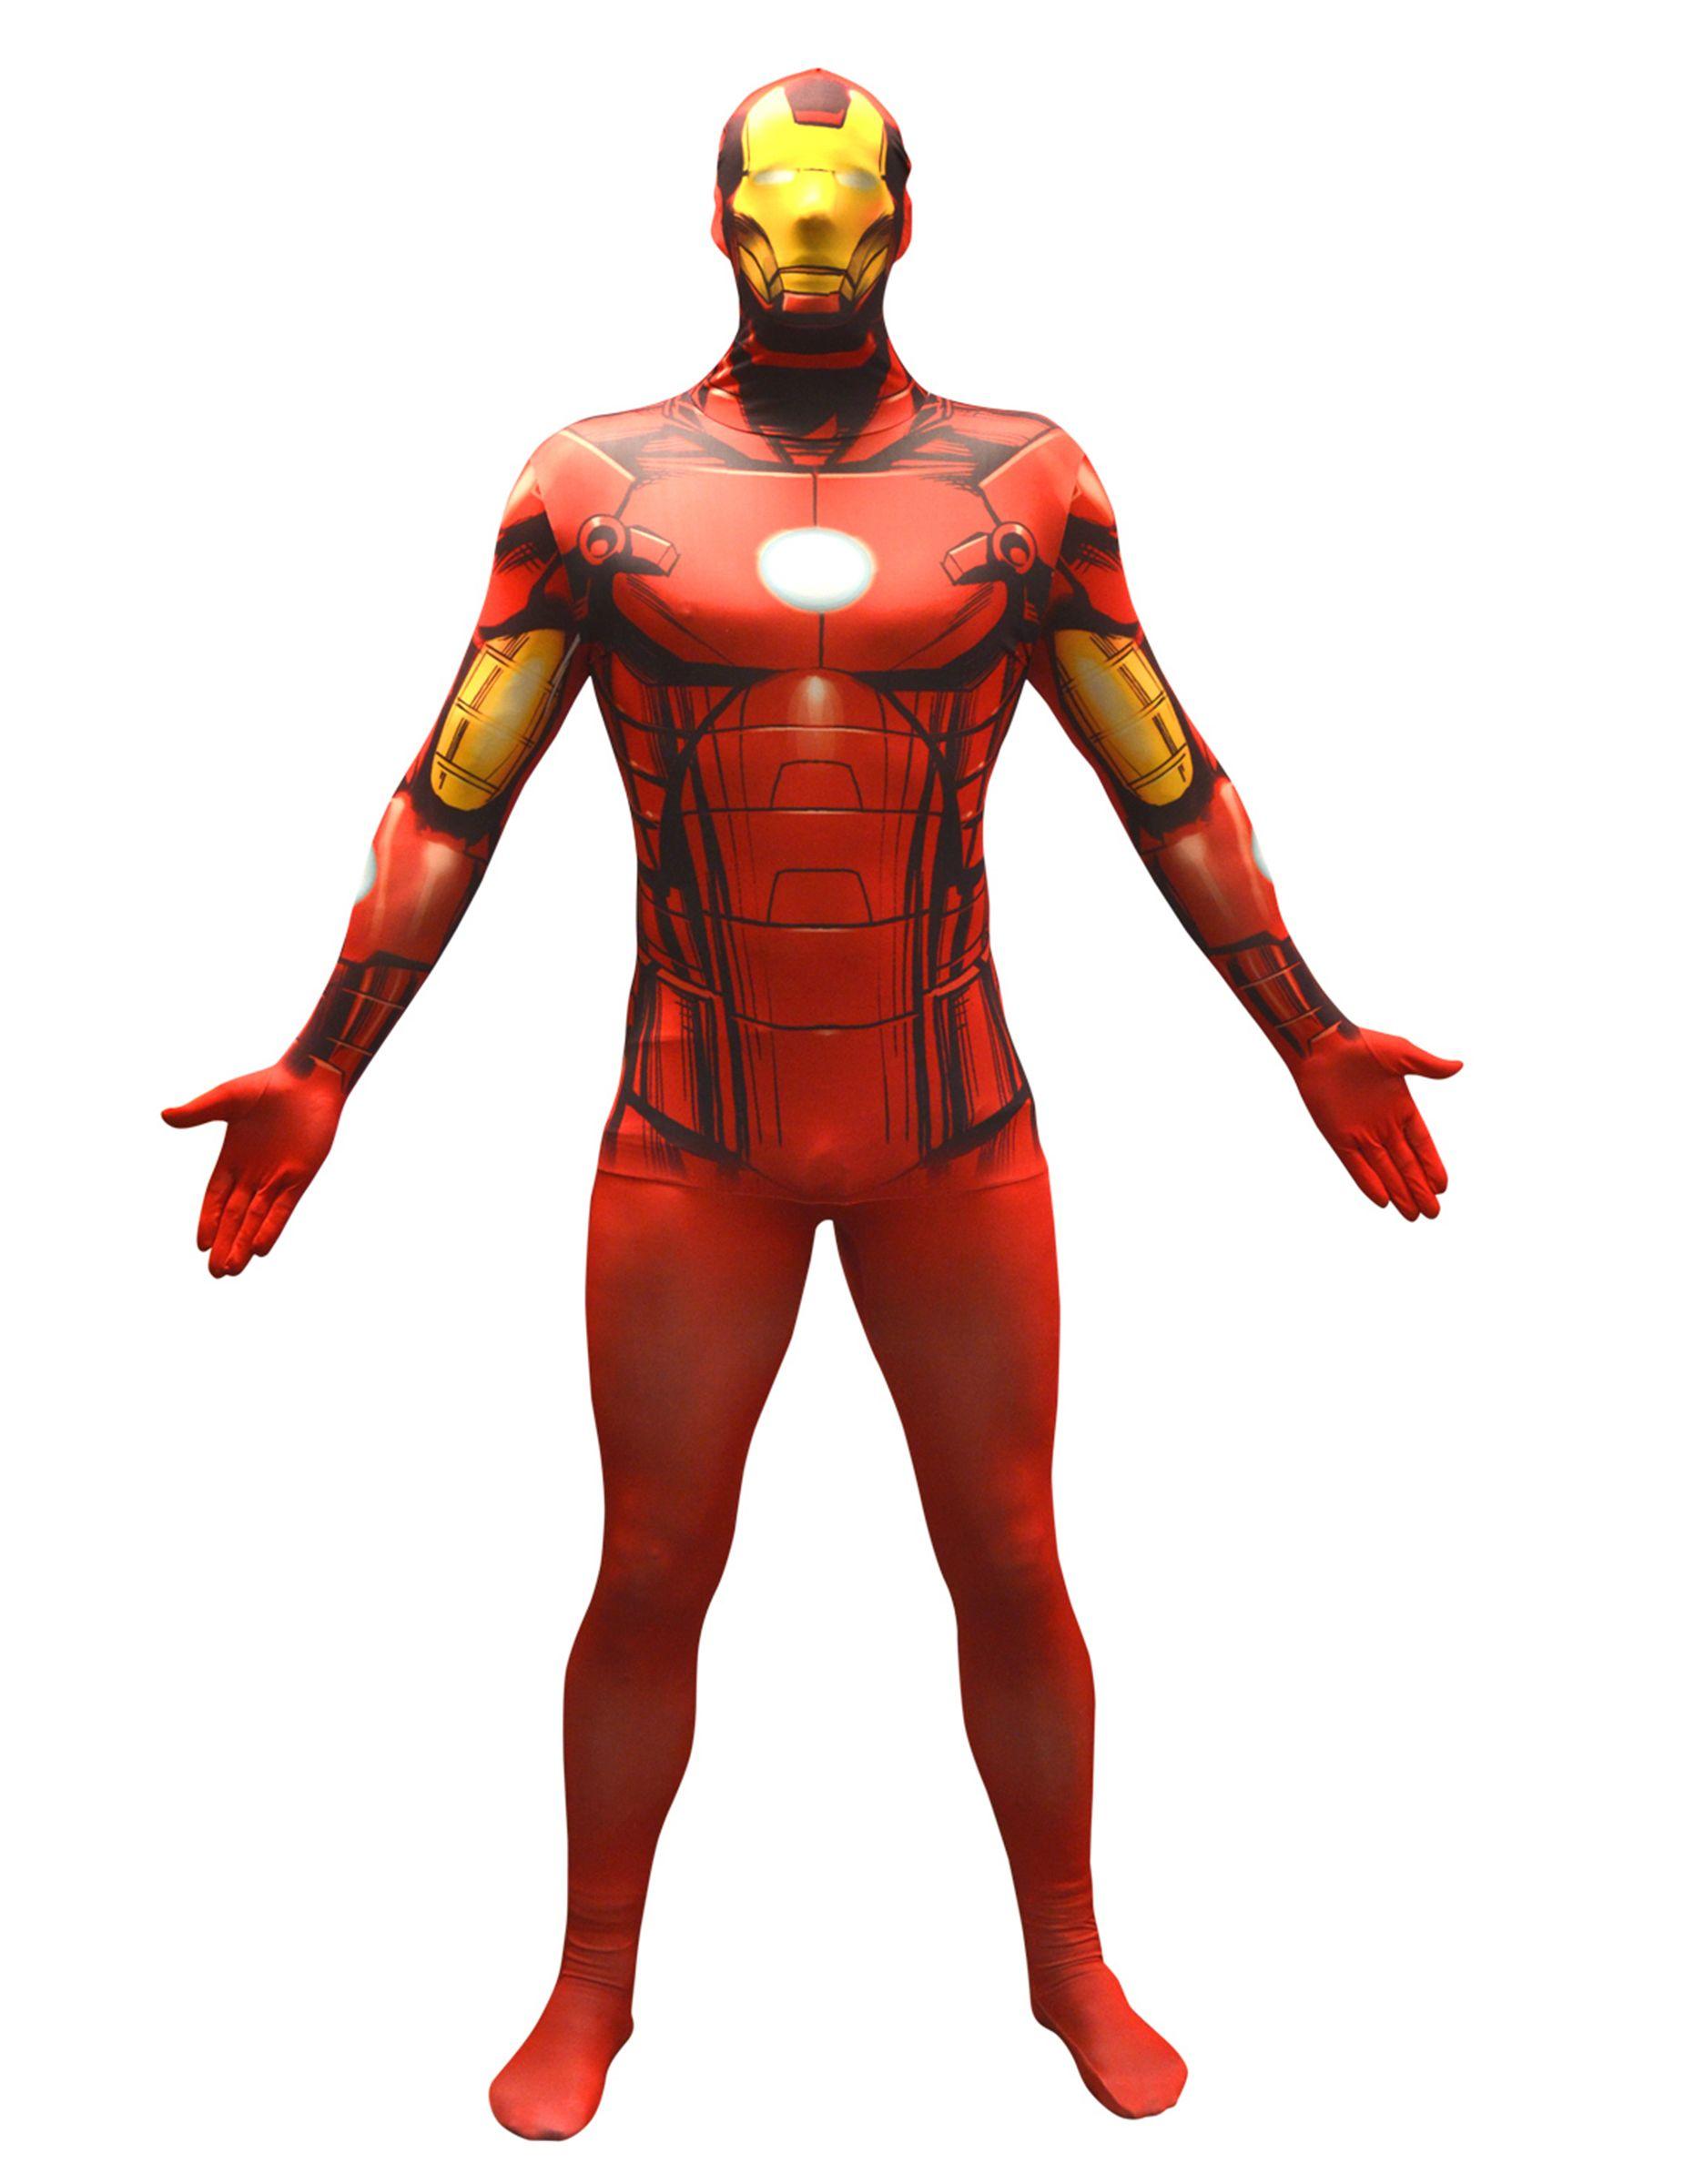 Marvel Iron Man Value Morphsuit Lizenzware Rot Schwarz Gunstige Faschings Kostume Bei Karneval Megastore Der Grosste Karn Superhelden Iron Man Party Artikel